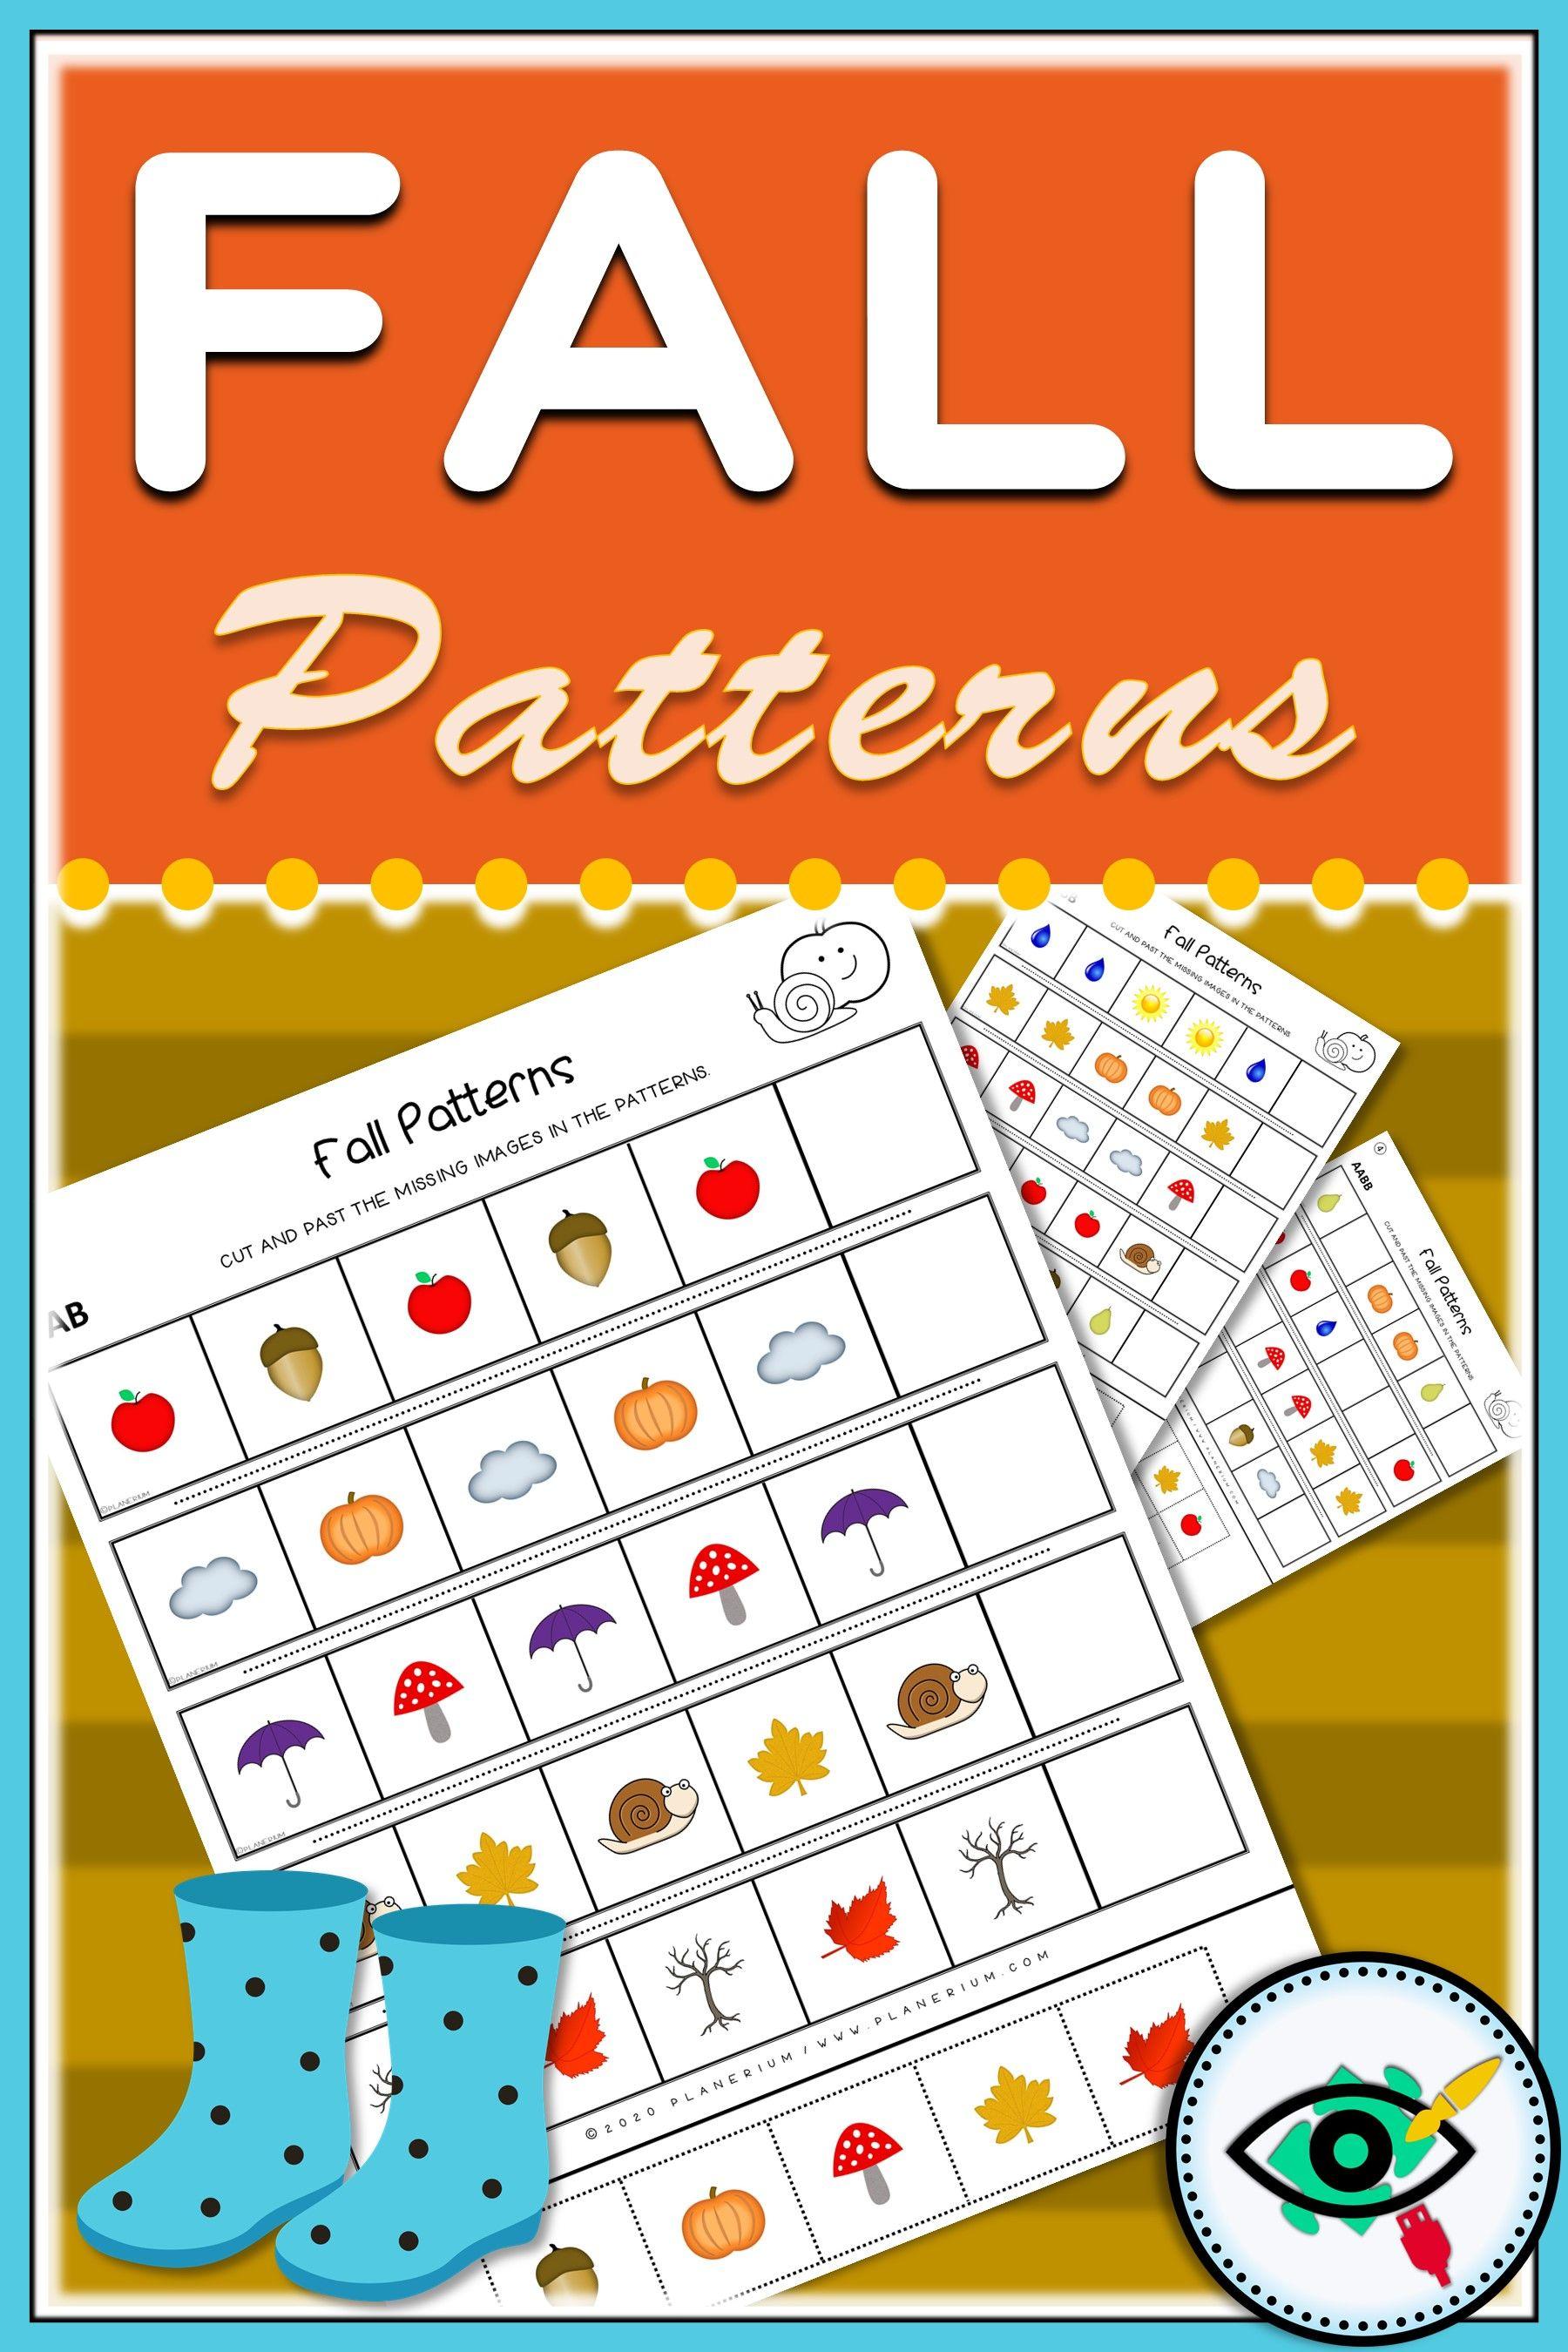 Fall Kids Patterns Printable In